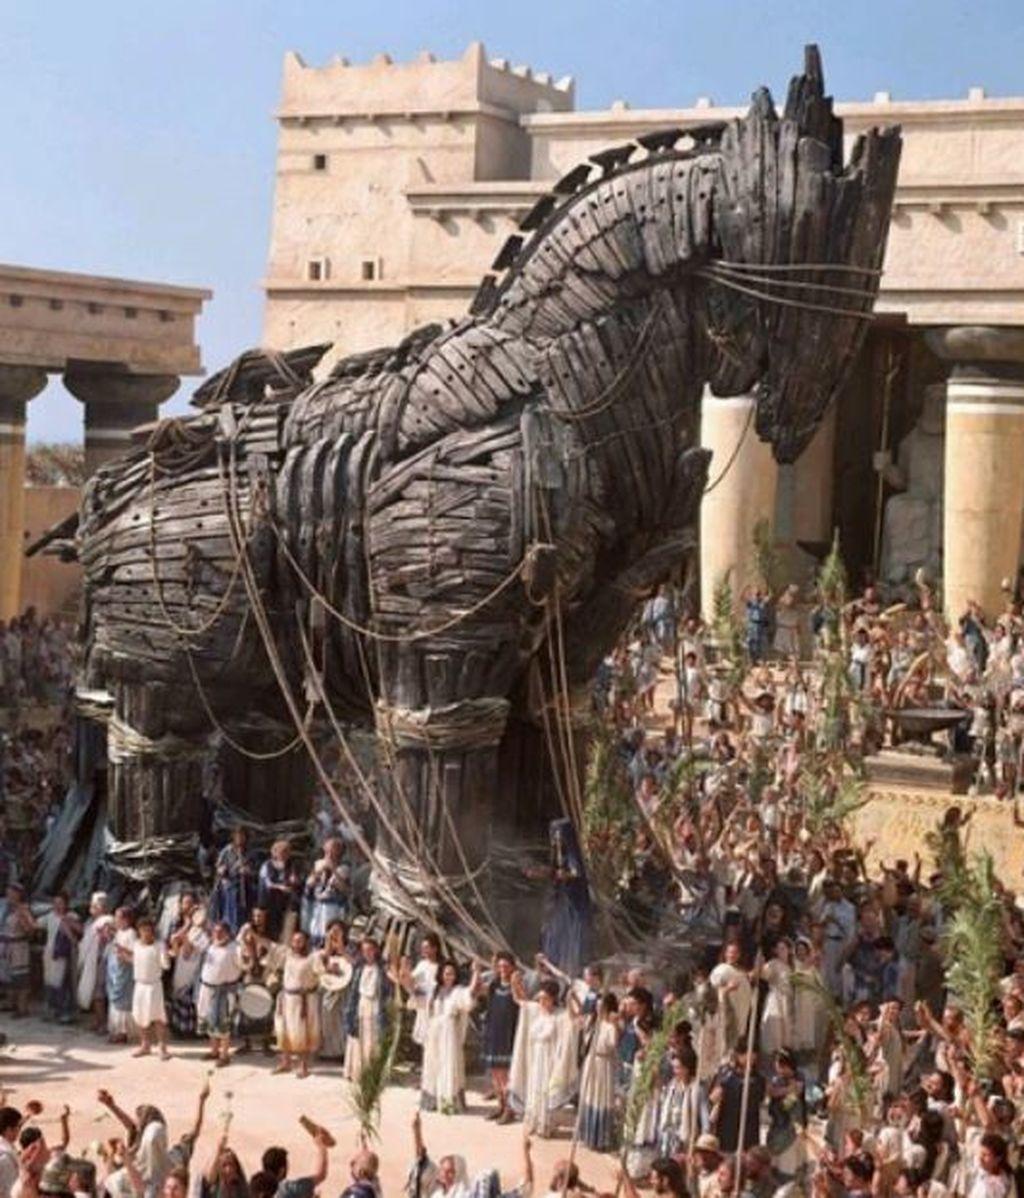 La leyenda del caballo de Troya, reescrita